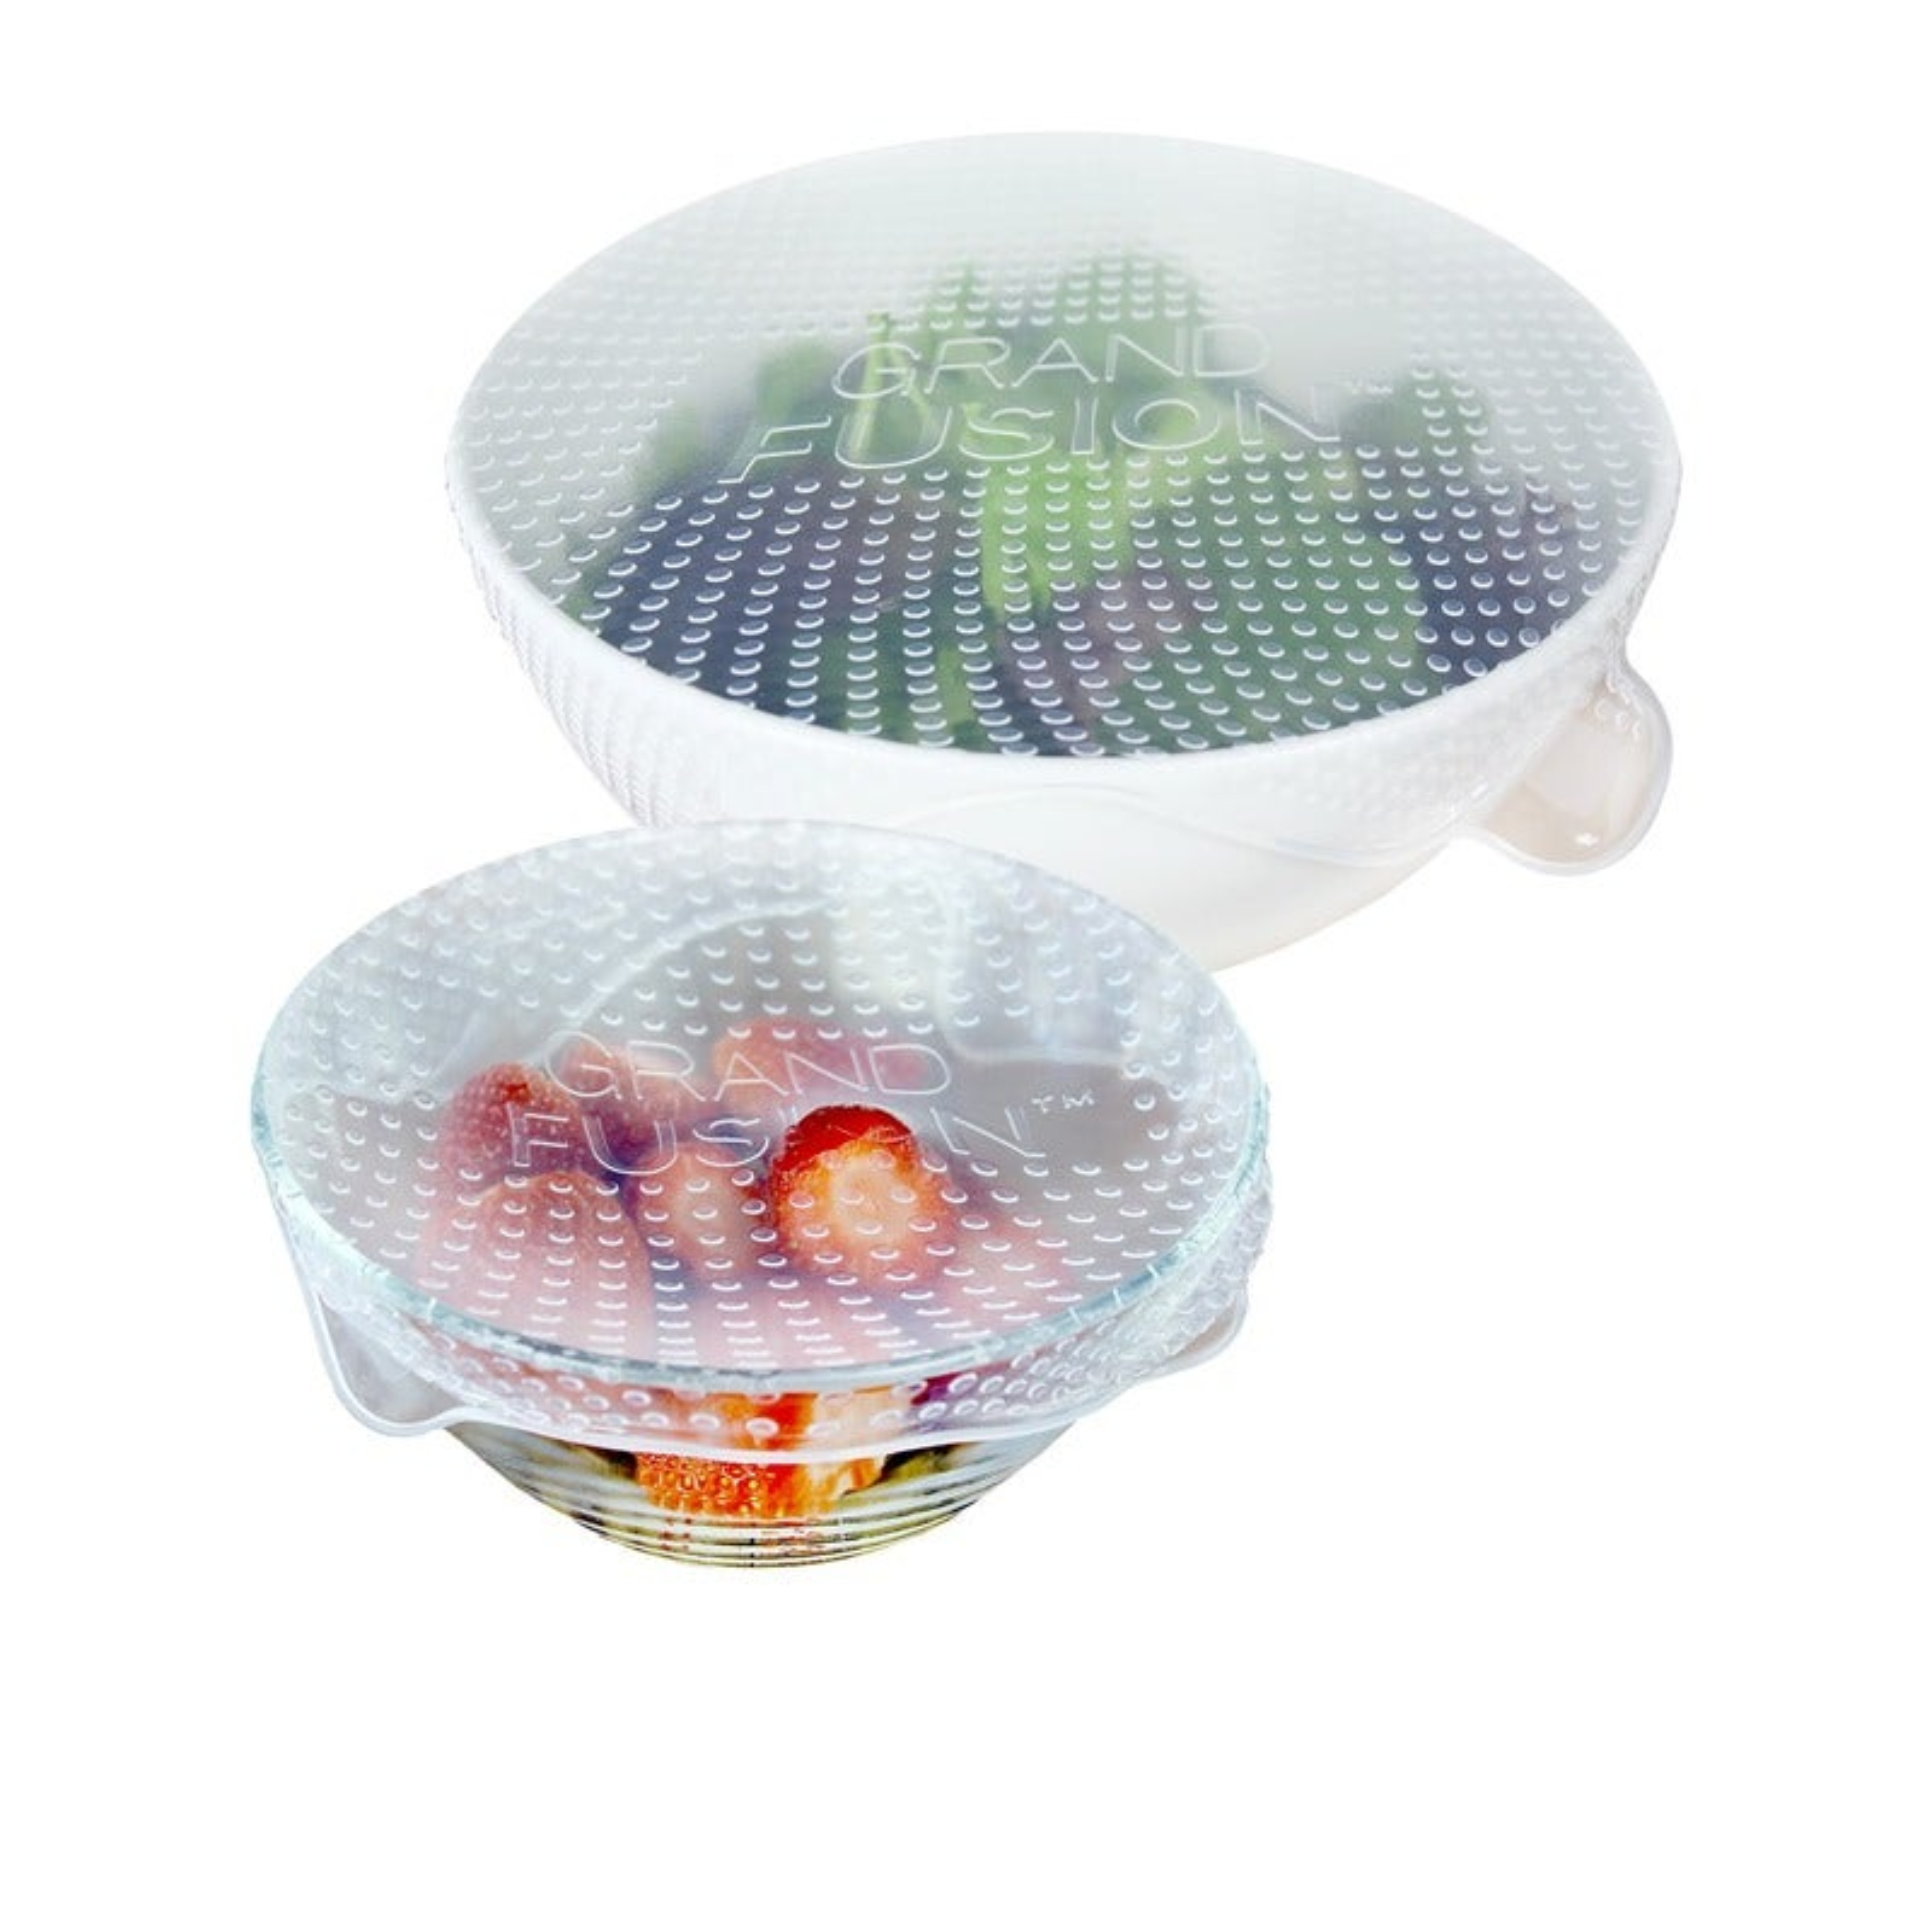 Grand Fusion 3pc Silicone Food Wrap Set XL